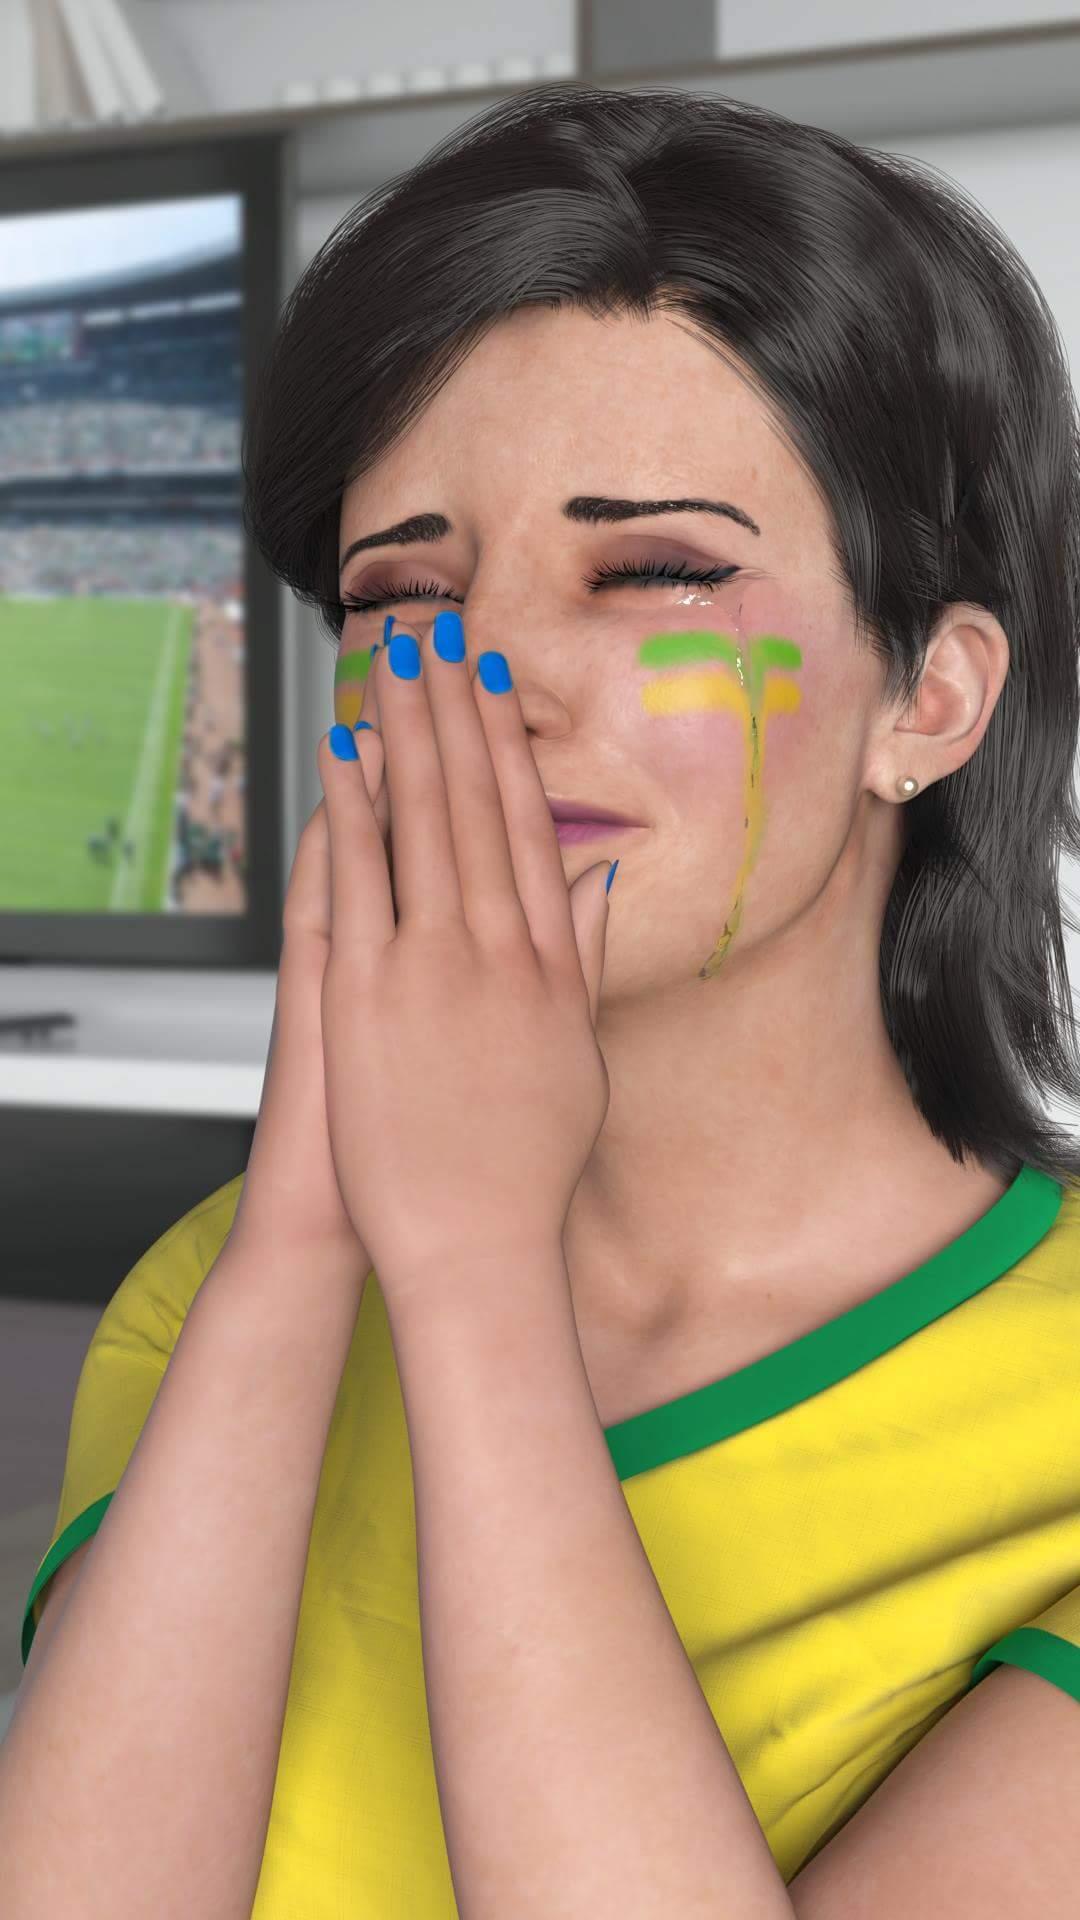 A LU DA MAGAZINE LUIZA TA CHORANDO :C - meme